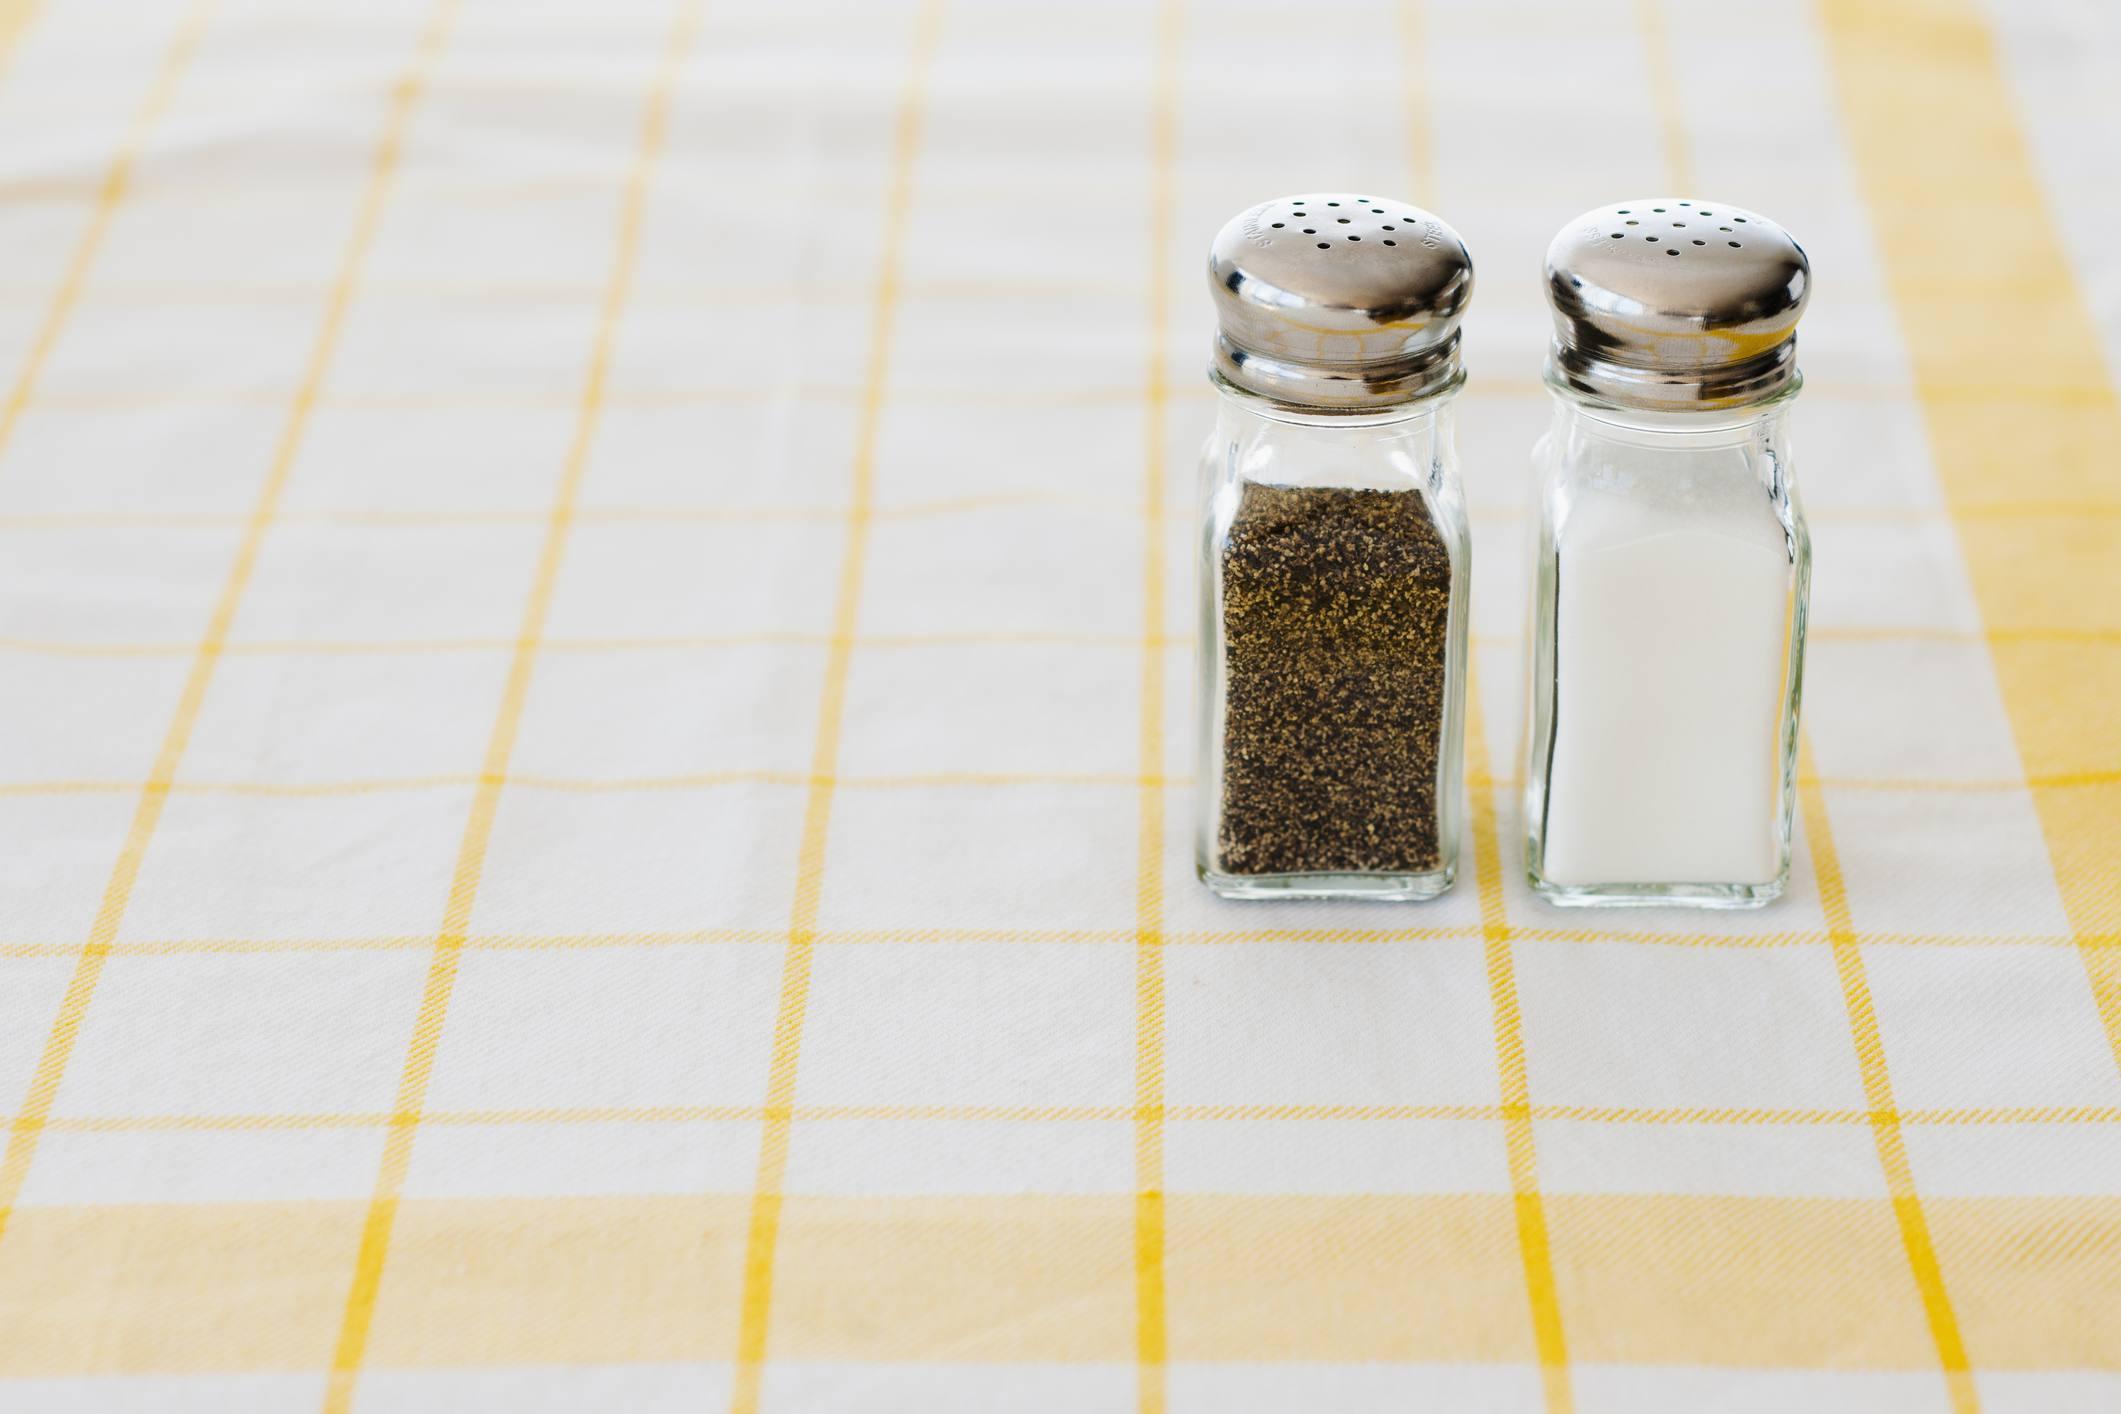 Pre-ground pepper and salt